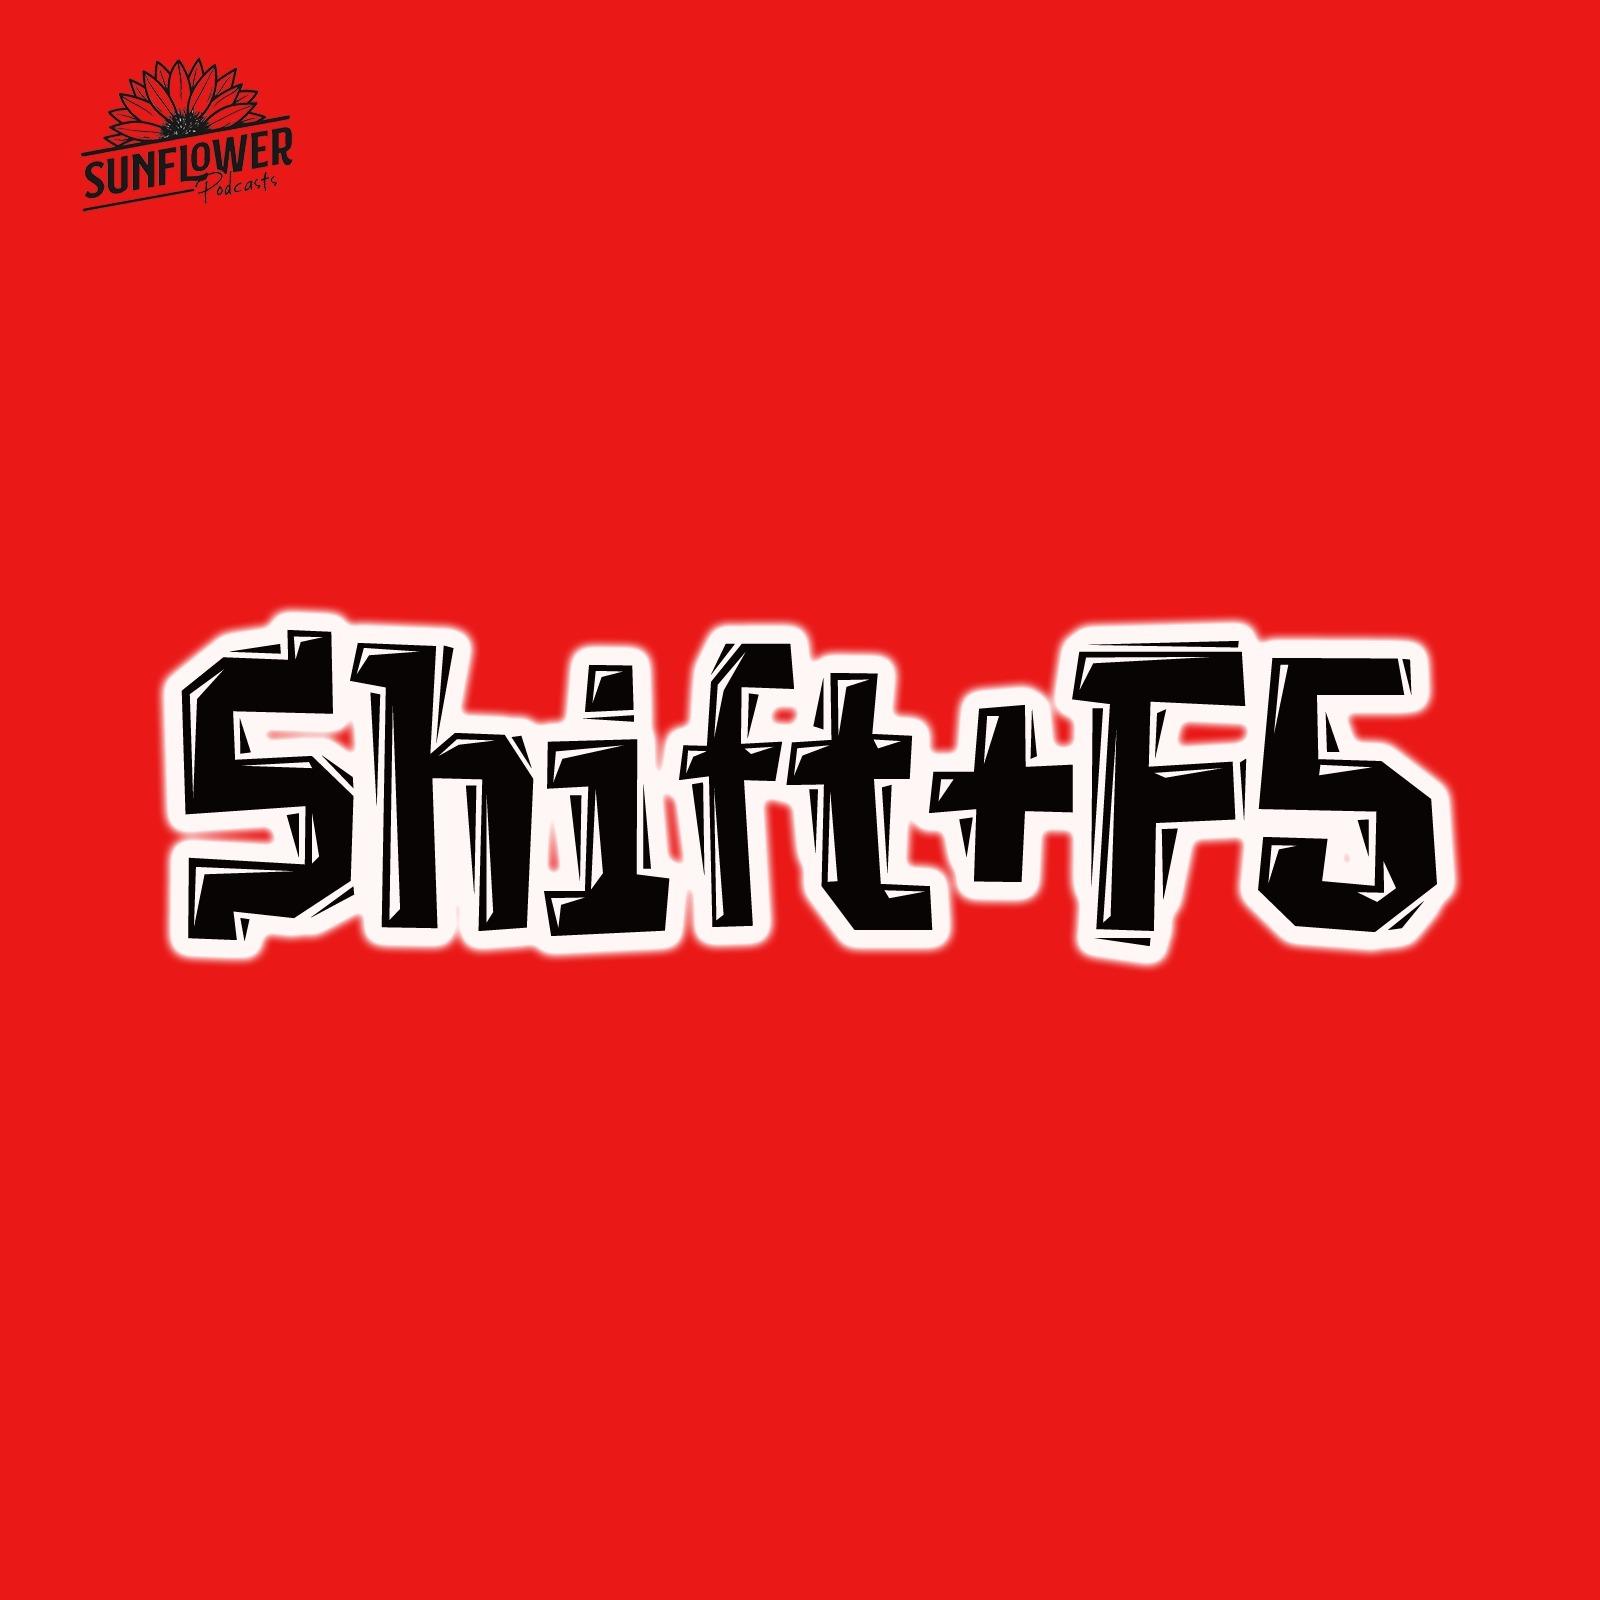 #103 -SHIFT+F5 - O que ninguém vê ninguém sabe. EP2